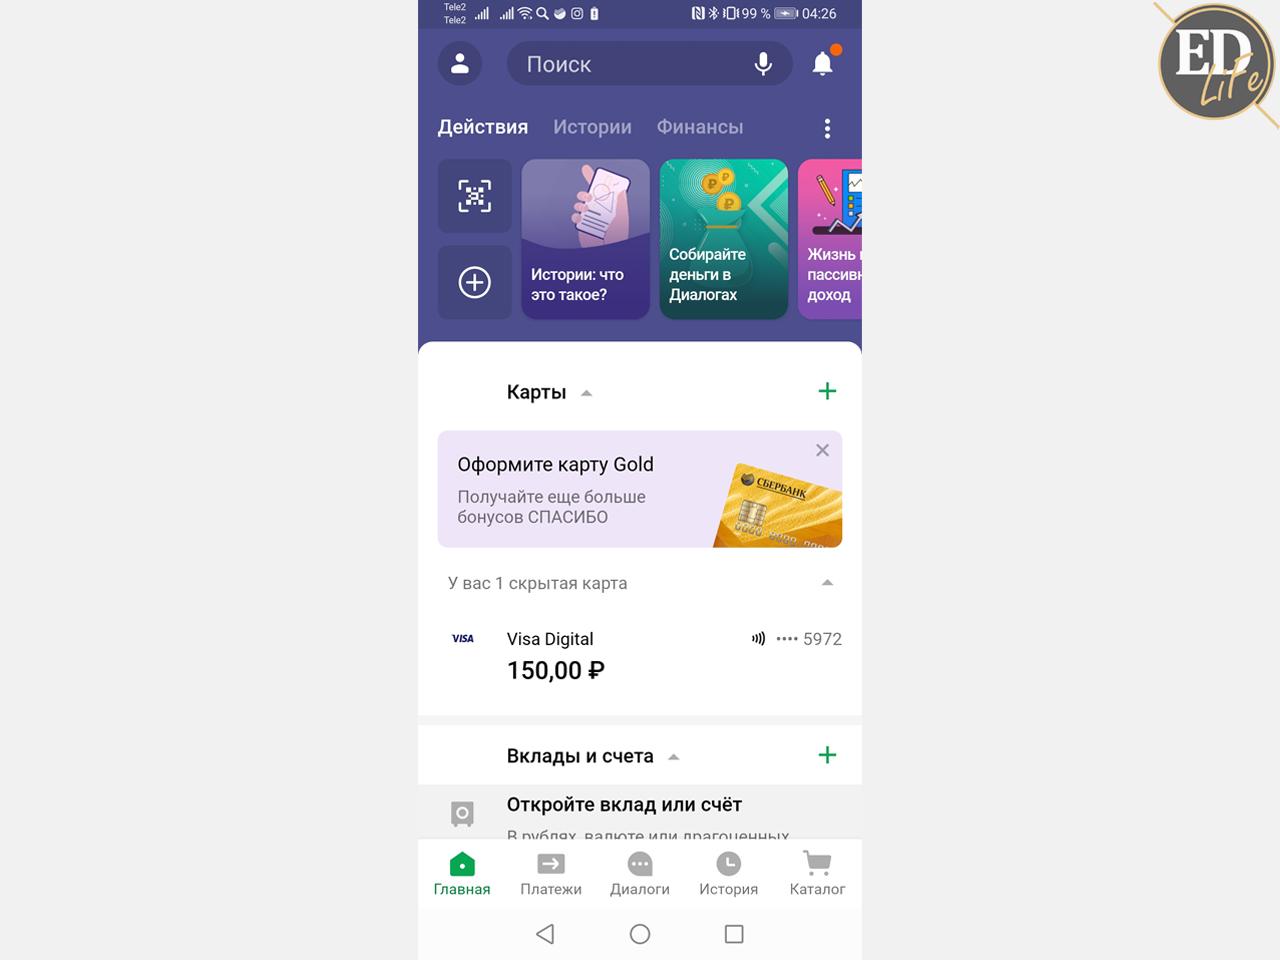 Приложение «Сбербанк Онлайн» в Google Play